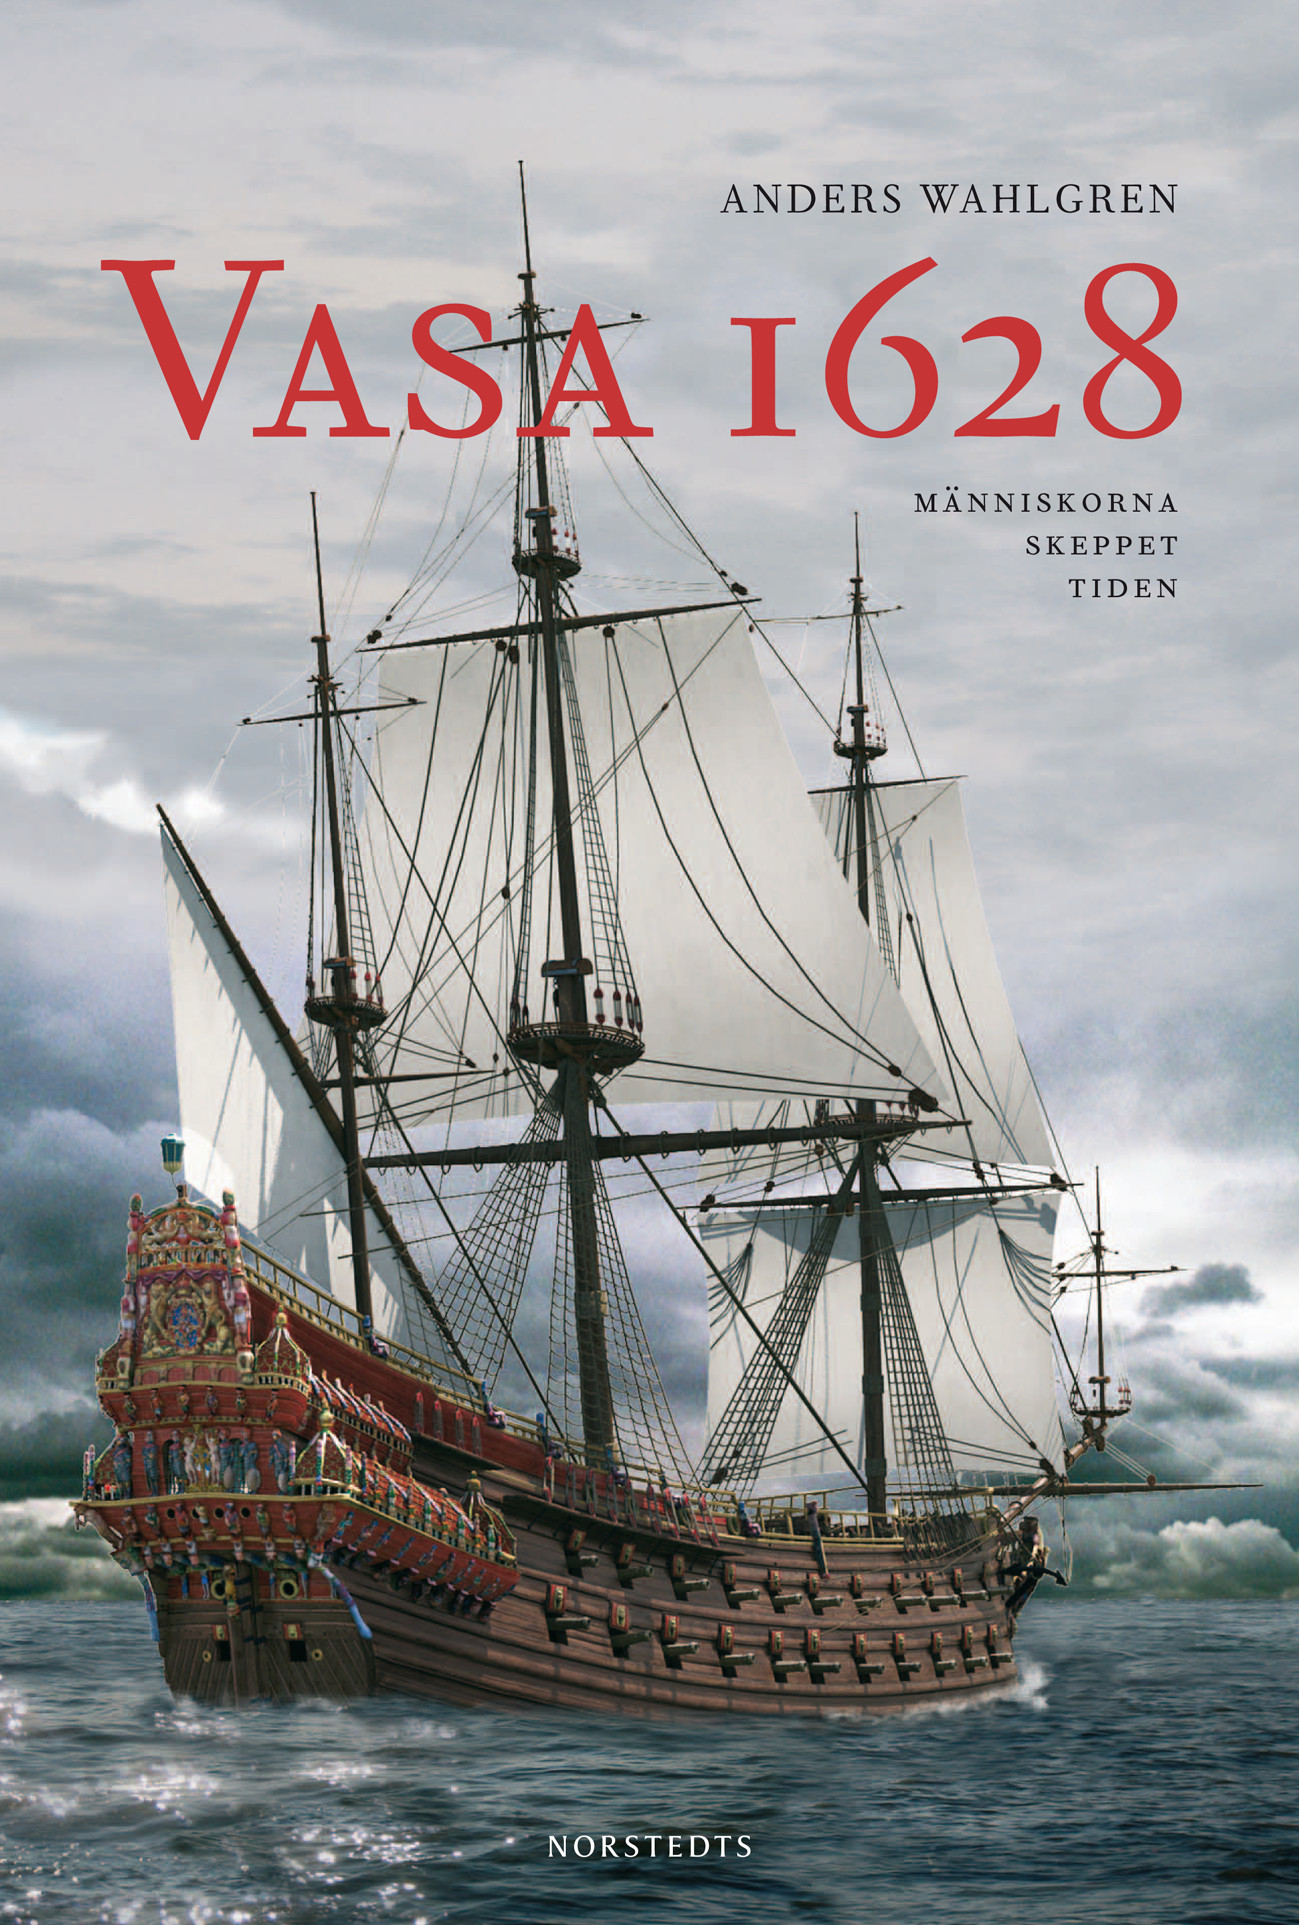 Vasa 1628 (TV Mini Series 2011–2012) - IMDb